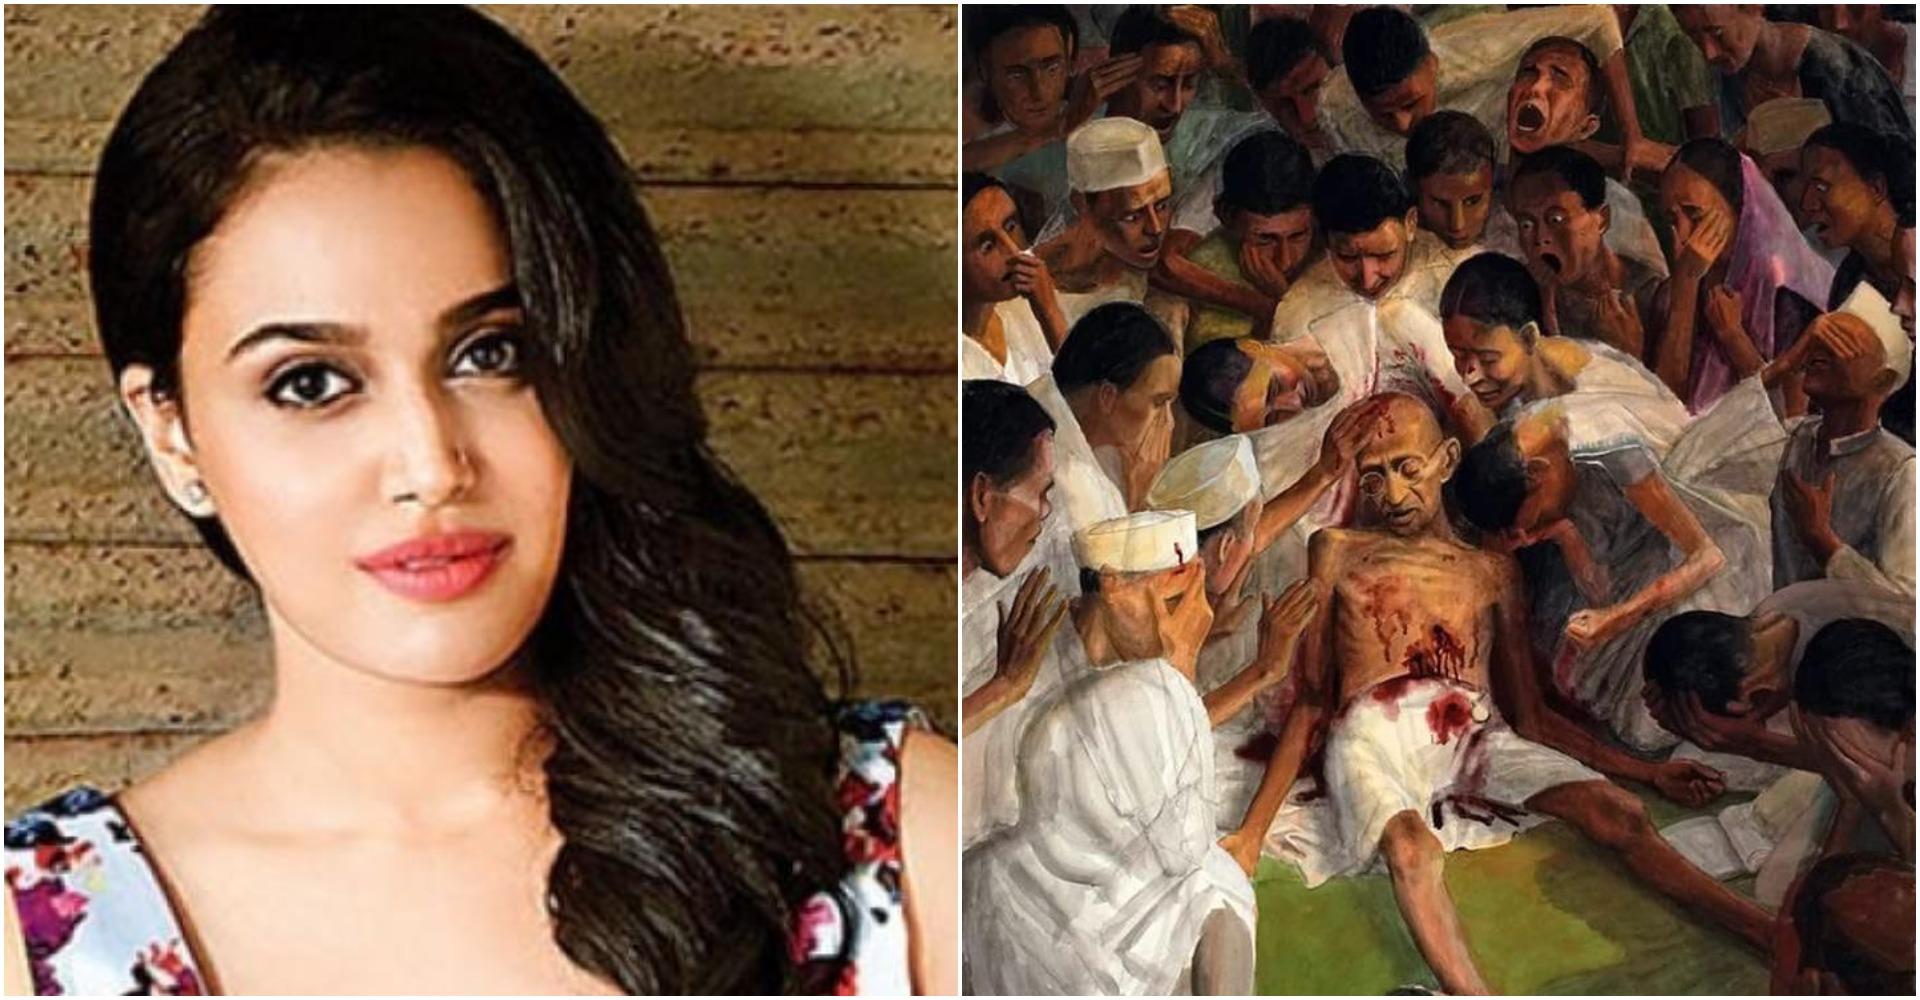 Swara Bhasker: स्वरा भास्कर ने महात्मा गांधी की पुण्यतिथि पर ट्ववीट कर बोली ये बात, ट्ववीट जमकर वायरल हुआ